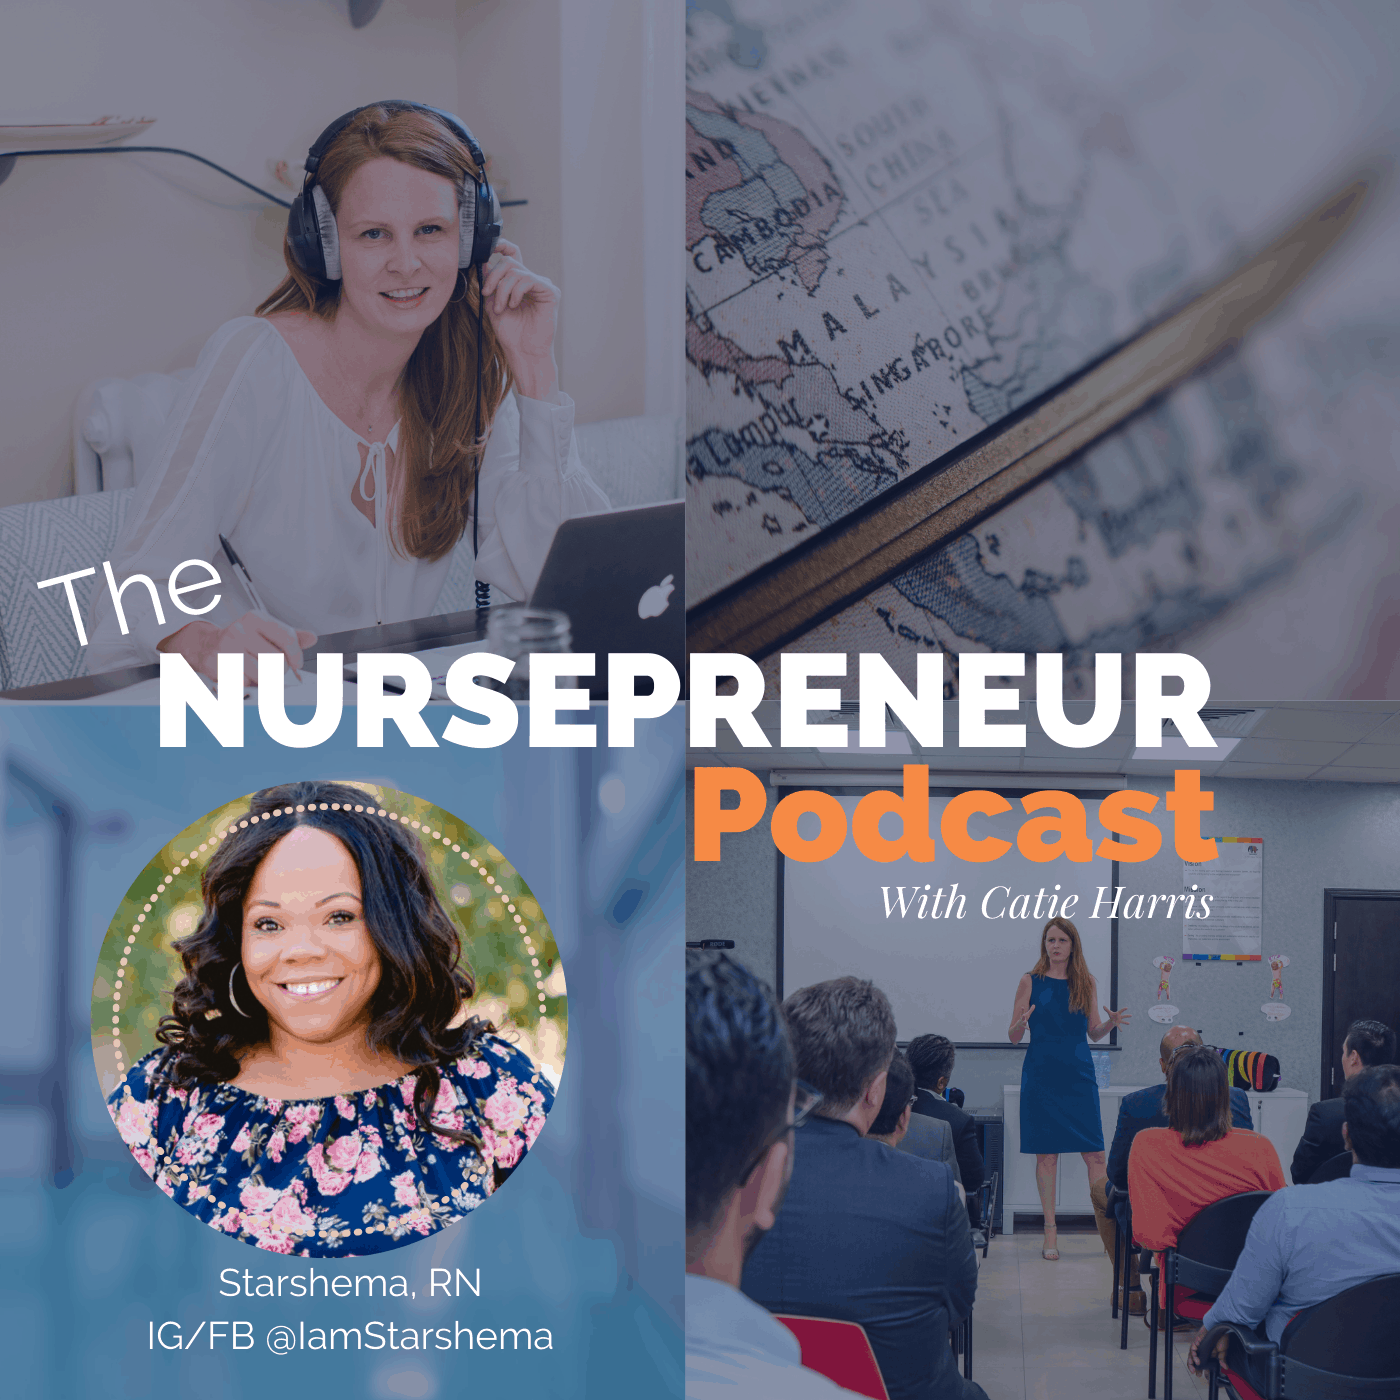 I Am Starshema NursePreneur Podcast